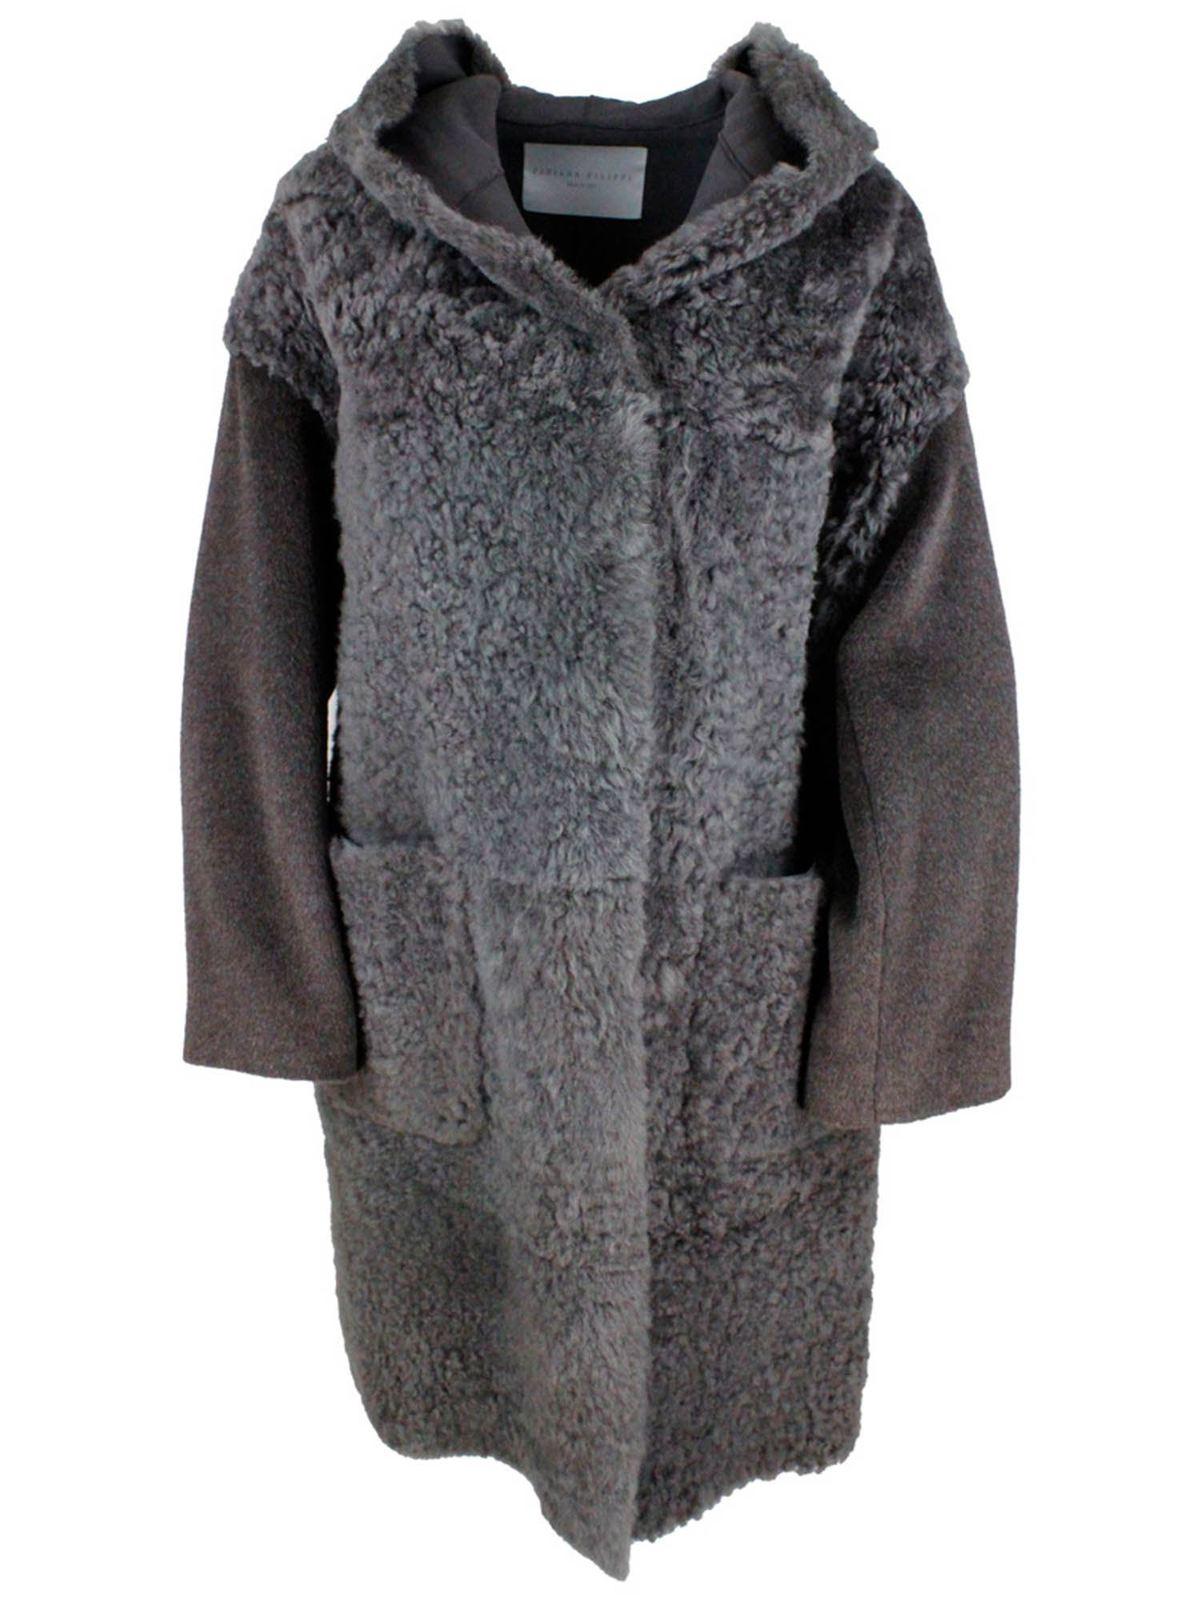 Fabiana Filippi SHEEPSKIN COAT IN AGATE BROWN COLOR